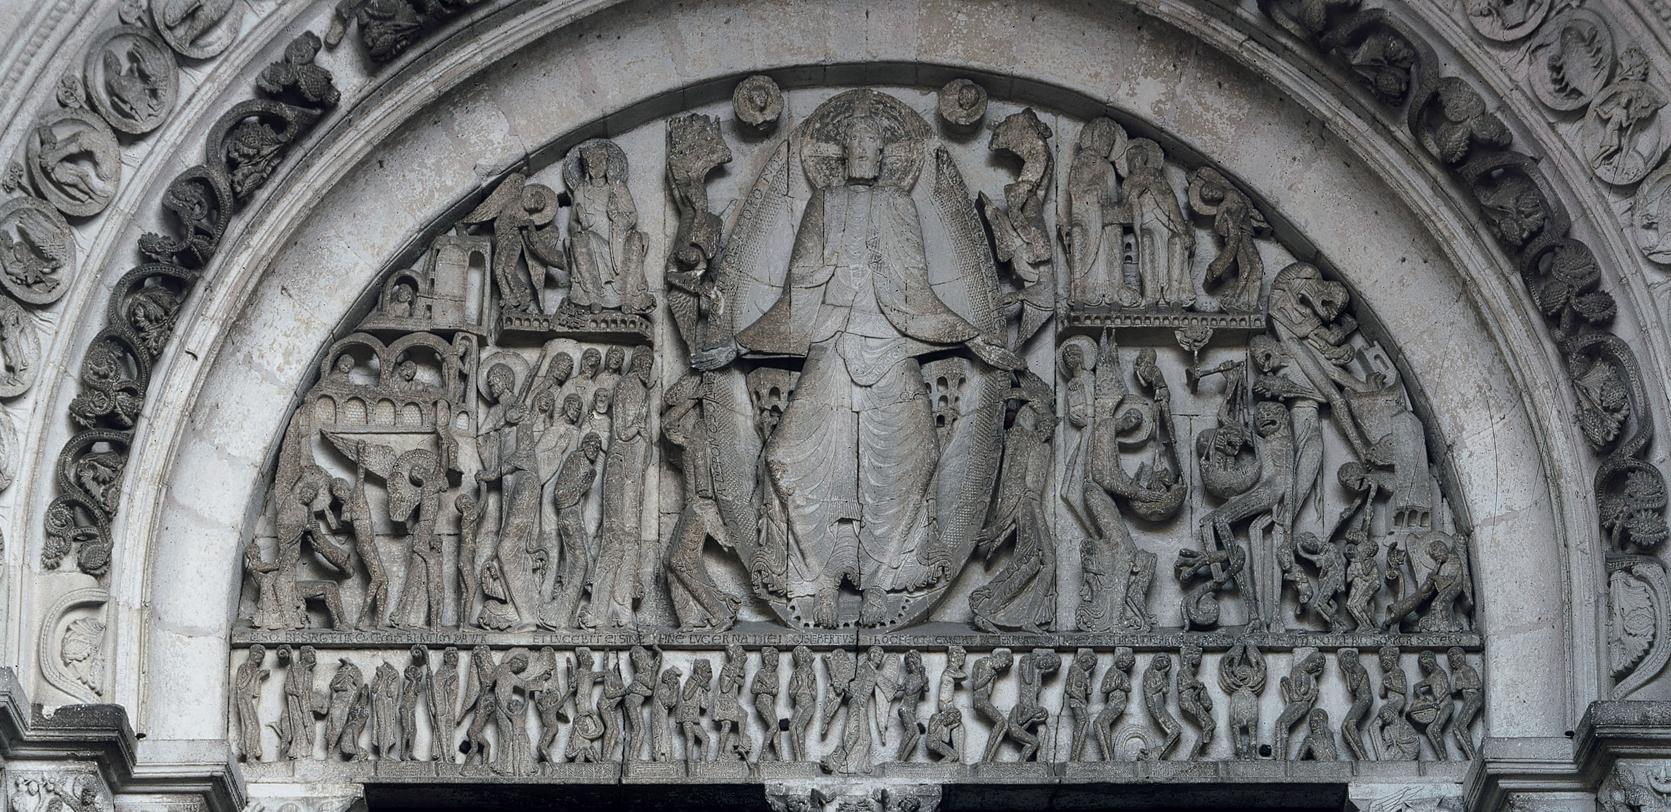 http://employees.oneonta.edu/farberas/arth/images/109images/Romanesque/Autun/lastjudg_tymp.jpg